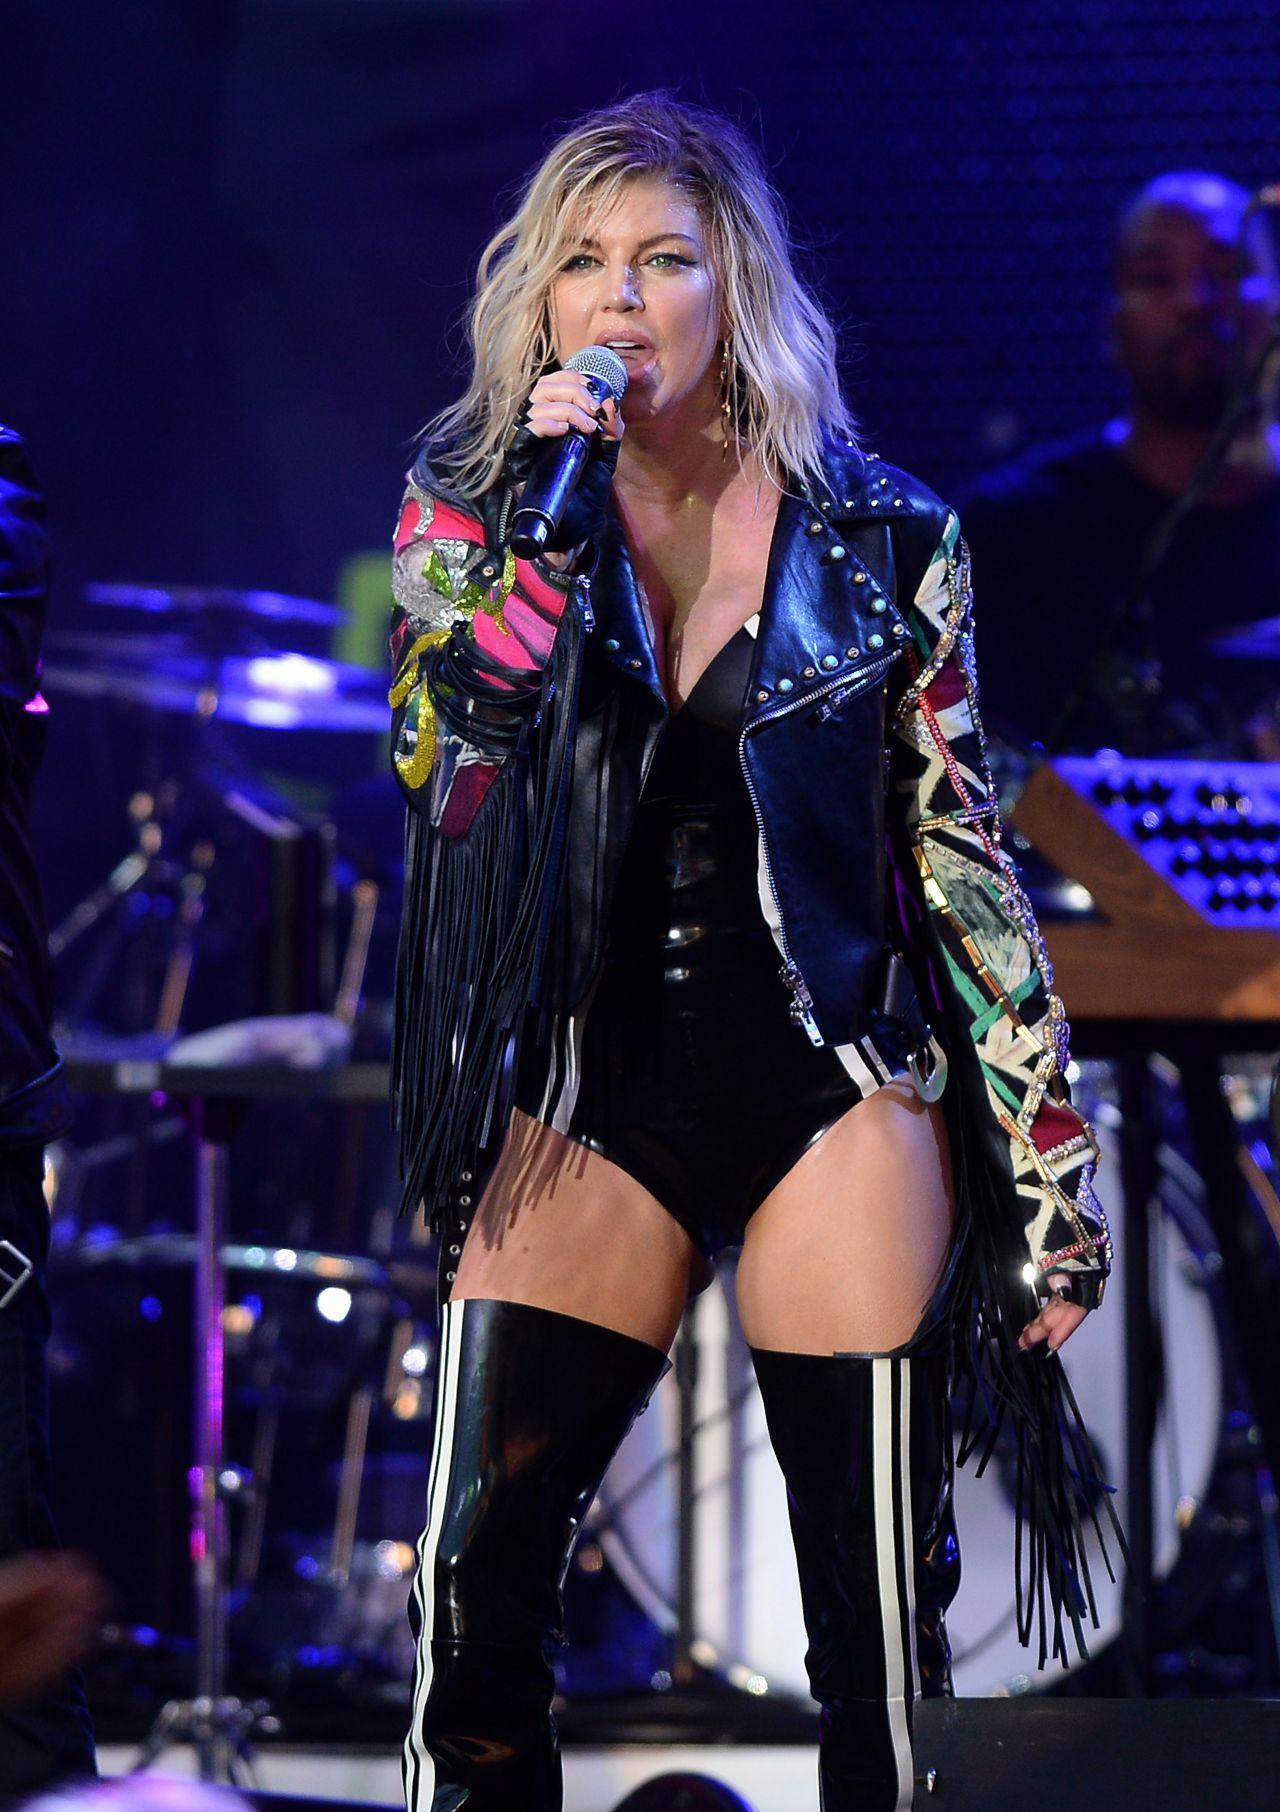 Stacy 'Fergie' Ferguson Performing at Pandora Summer Crush ...